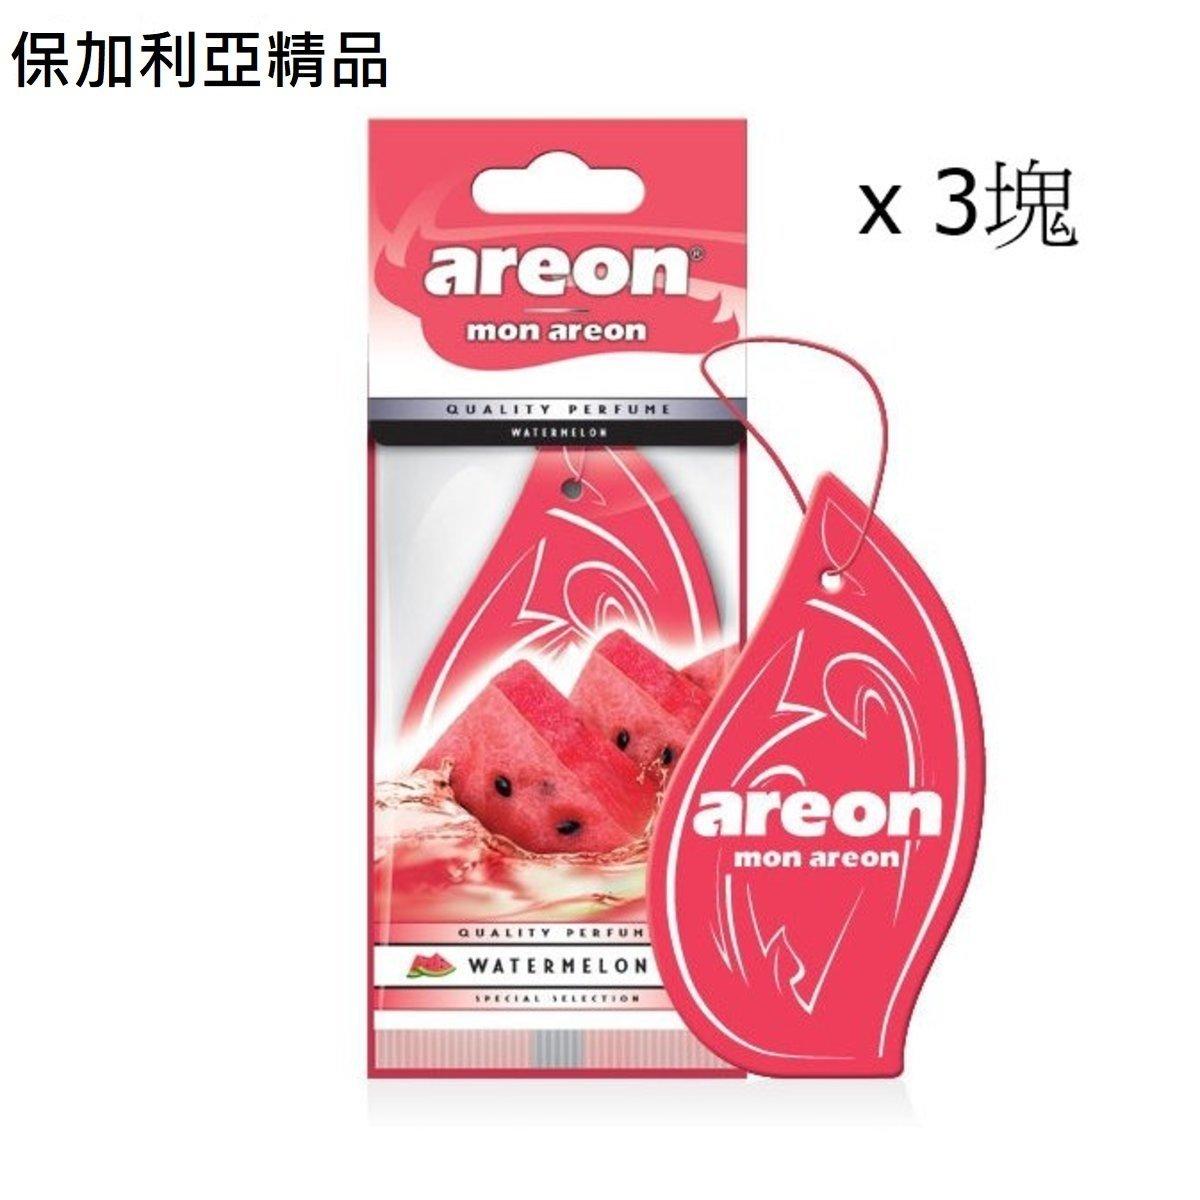 Mon Areon 悠閒品味系列 香薰片 - Watermelon (3 pcs)